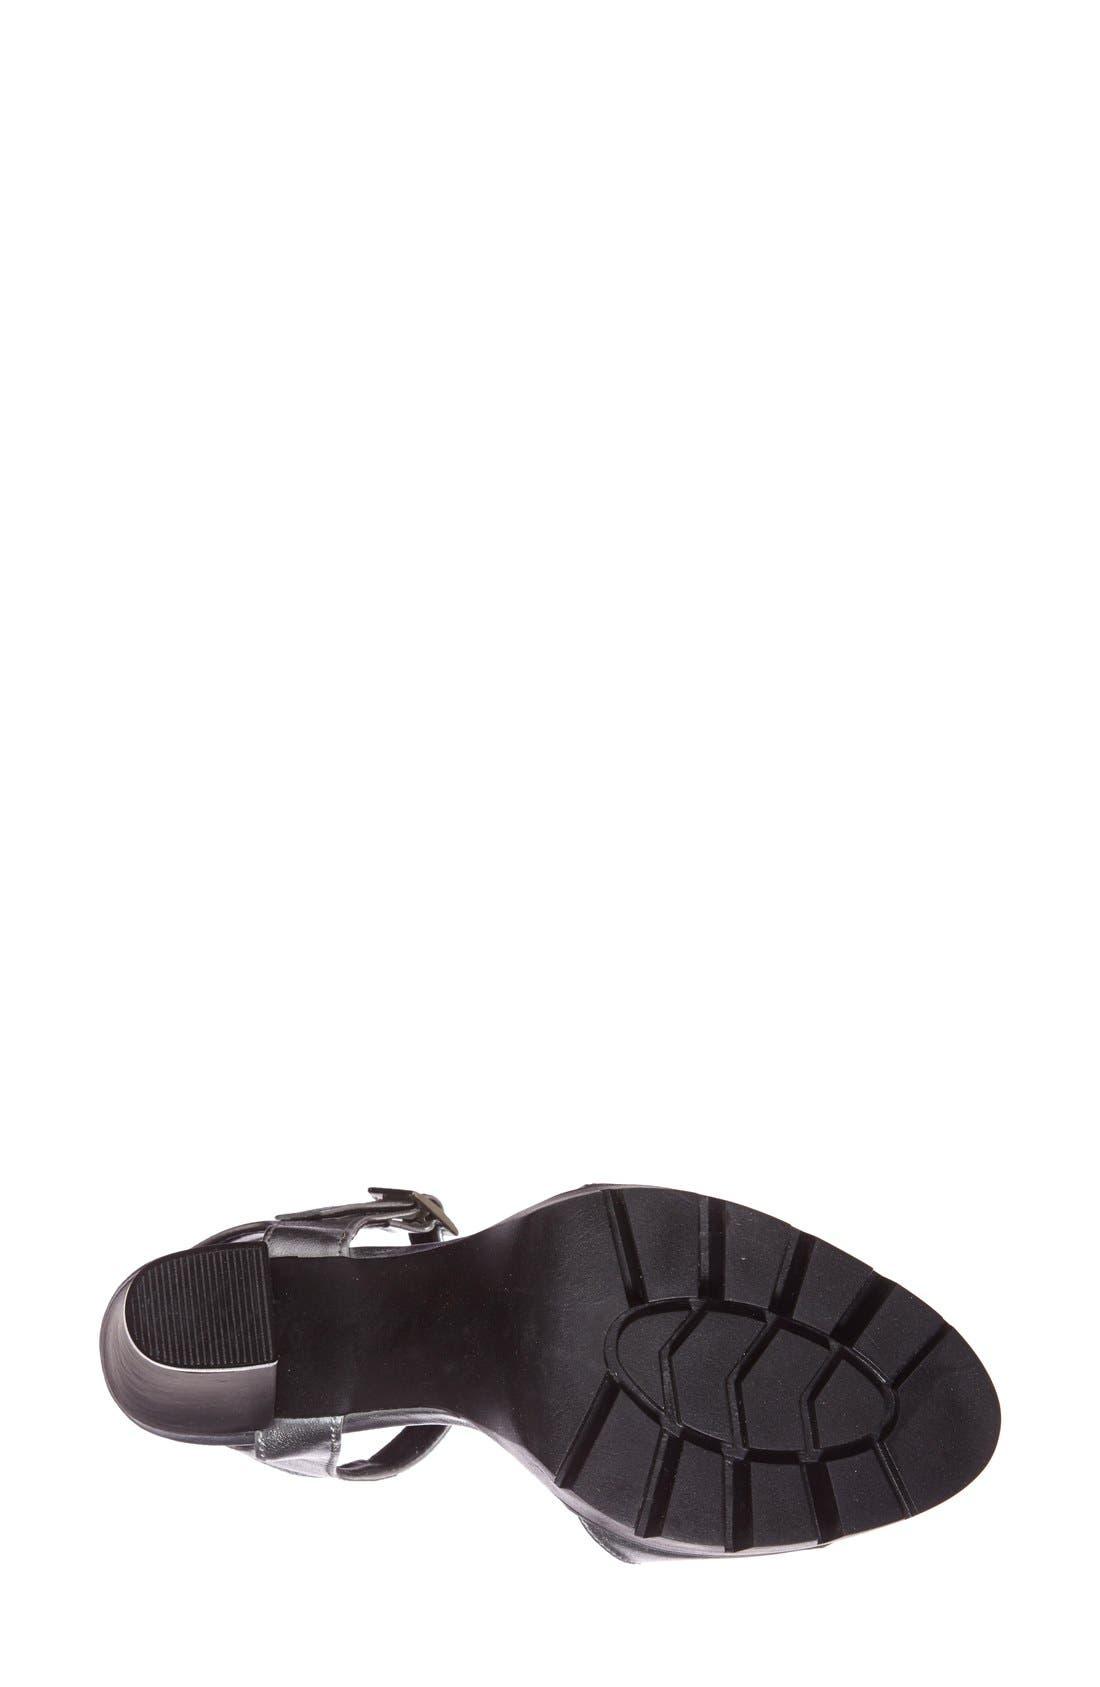 'Traviss' Sandal,                             Alternate thumbnail 4, color,                             Silver Leather